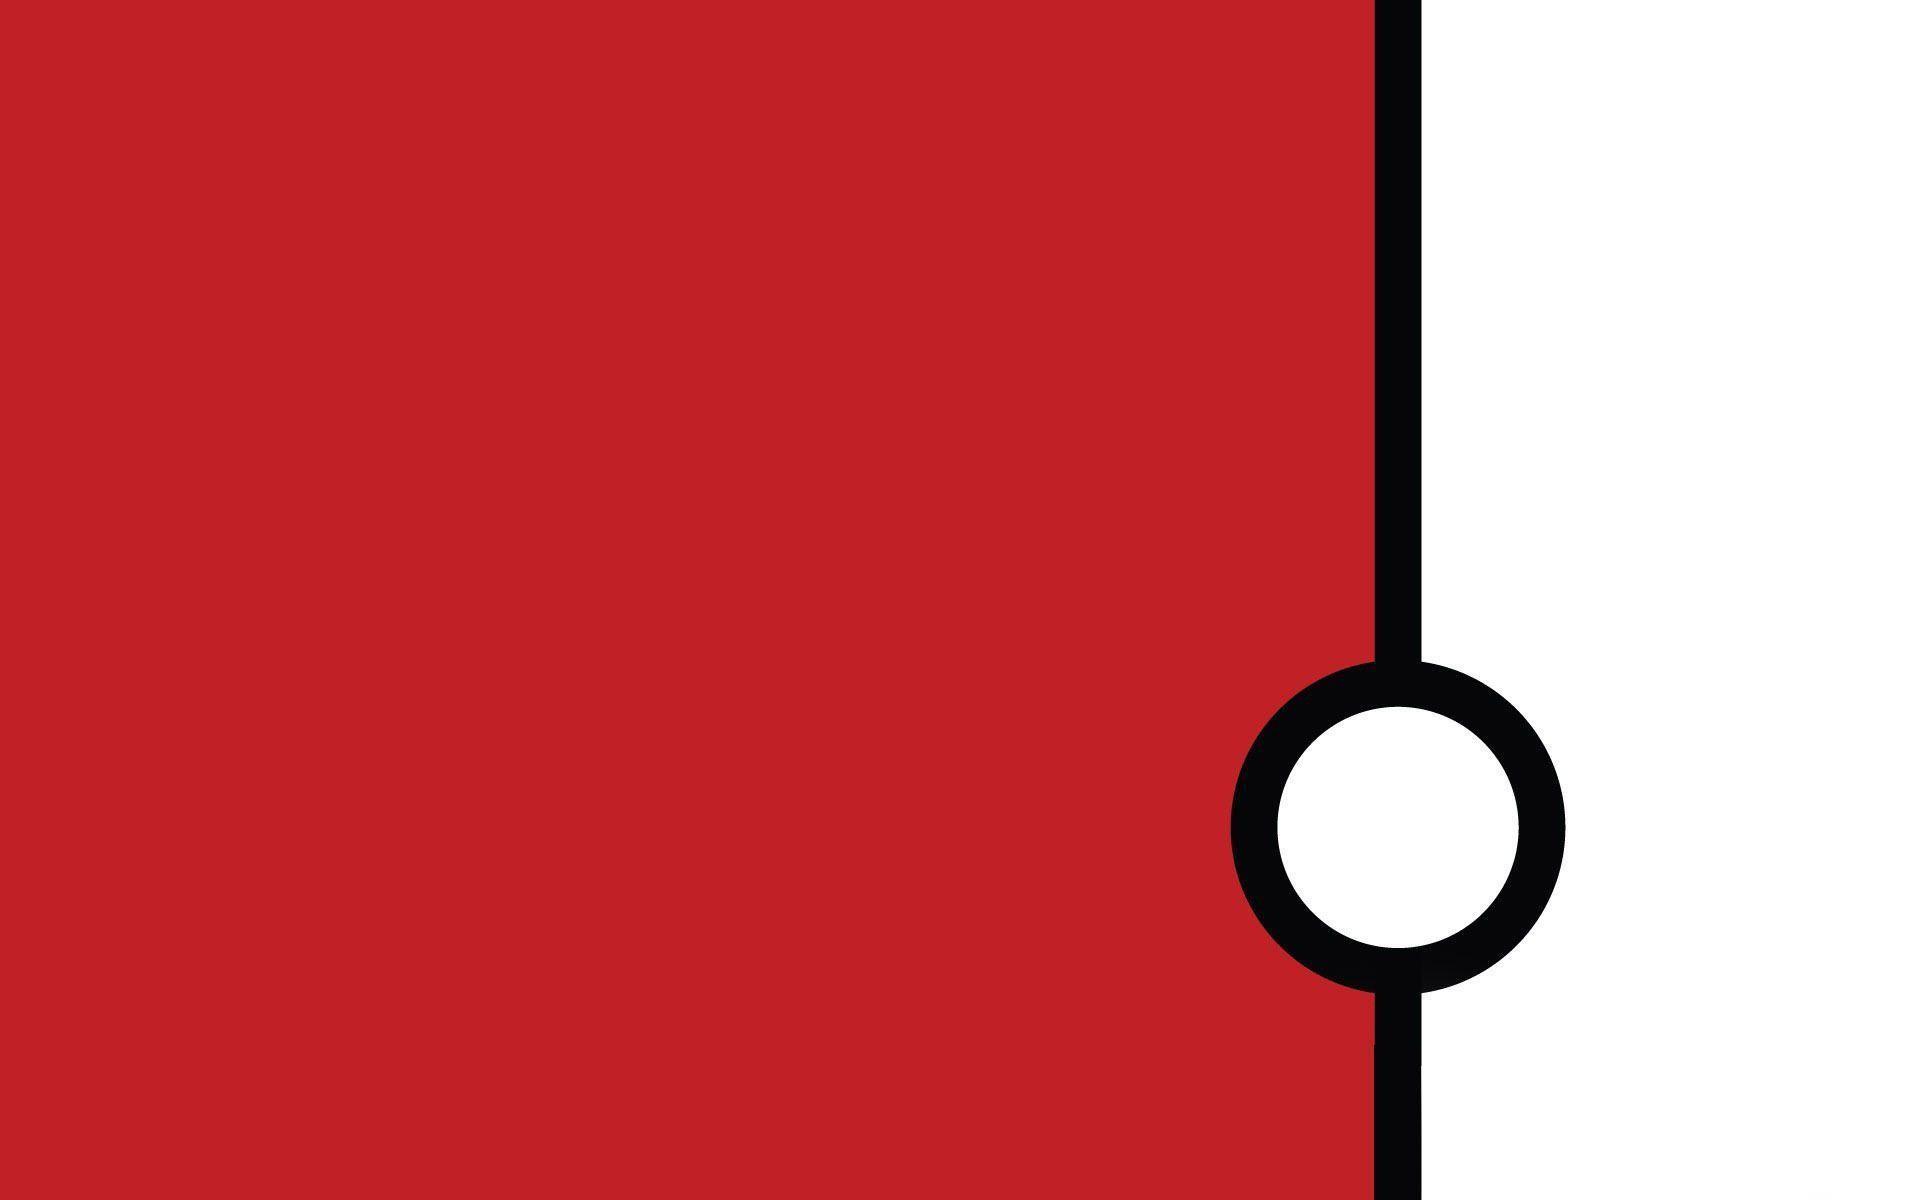 Pokeball Wallpapers – Full HD wallpaper search